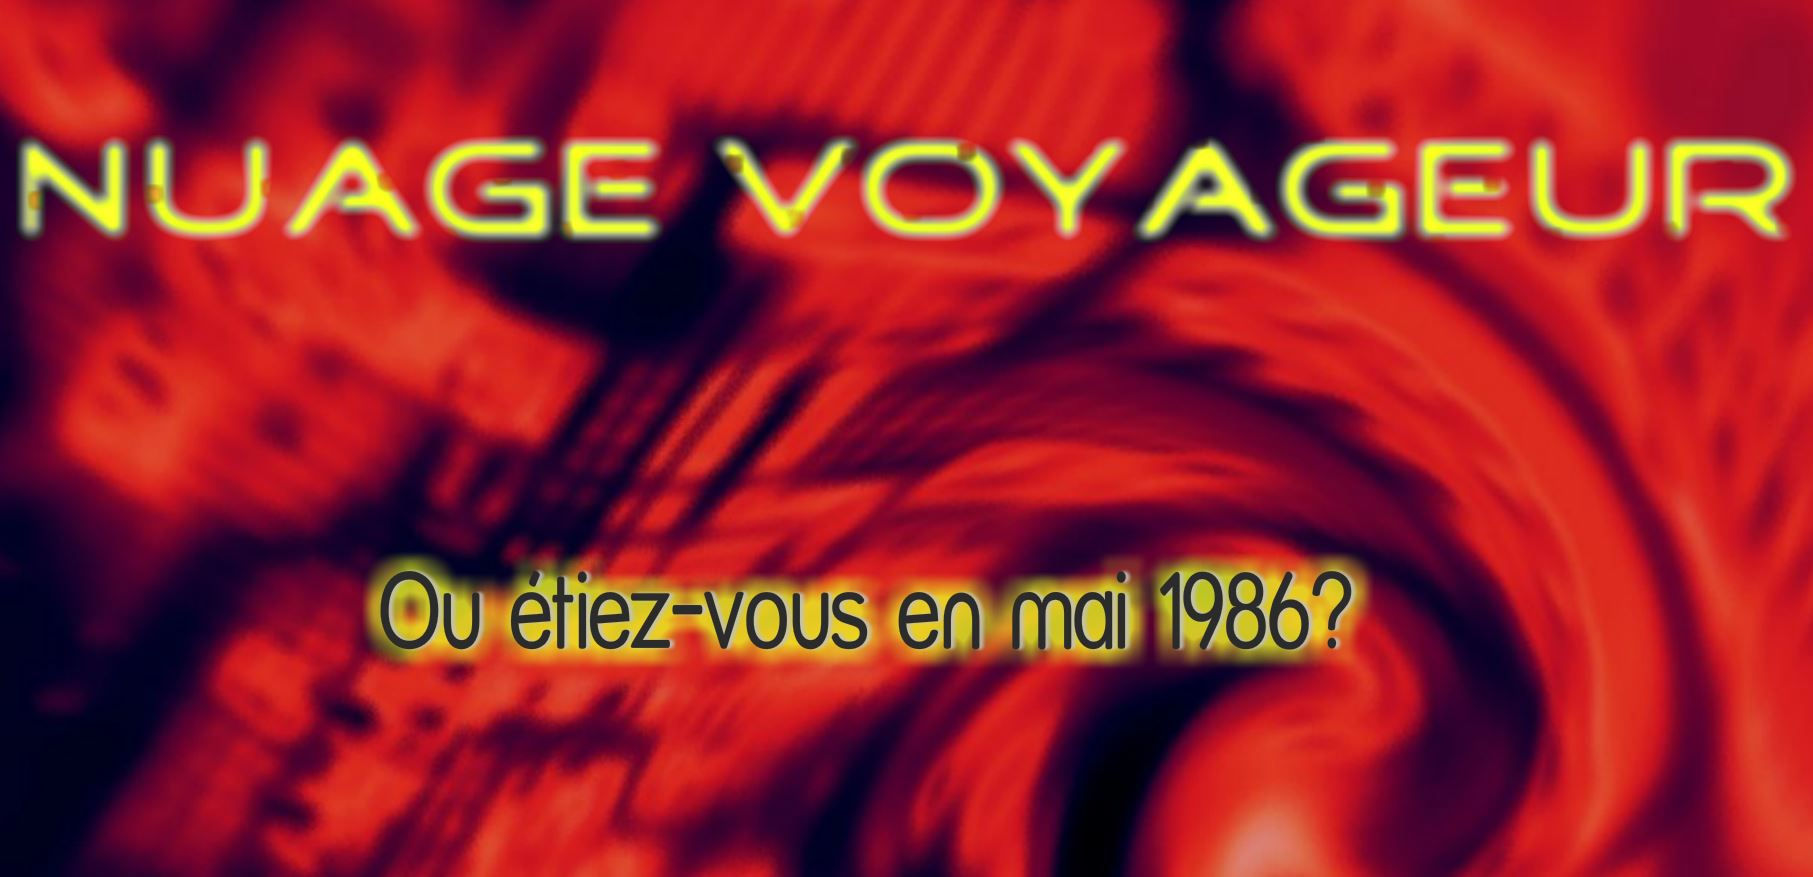 Nuage voyageur web docu